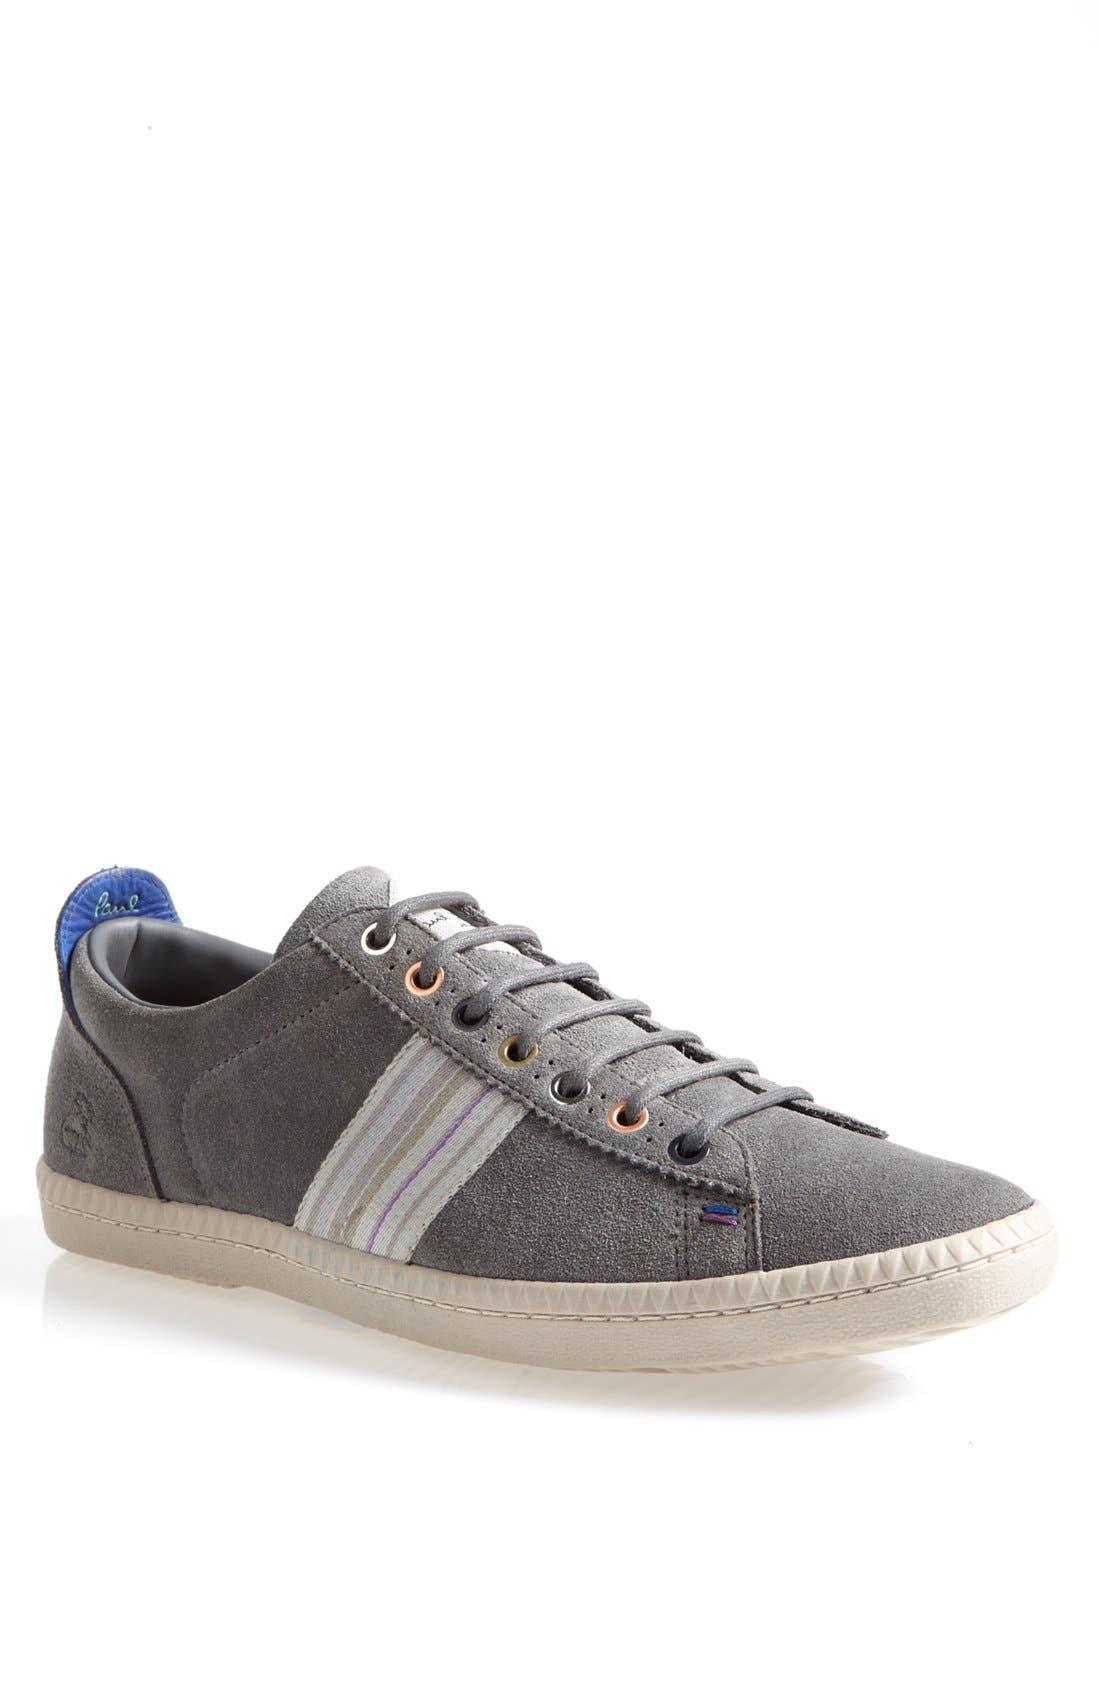 Alternate Image 1 Selected - Paul Smith 'Osmo' Sneaker